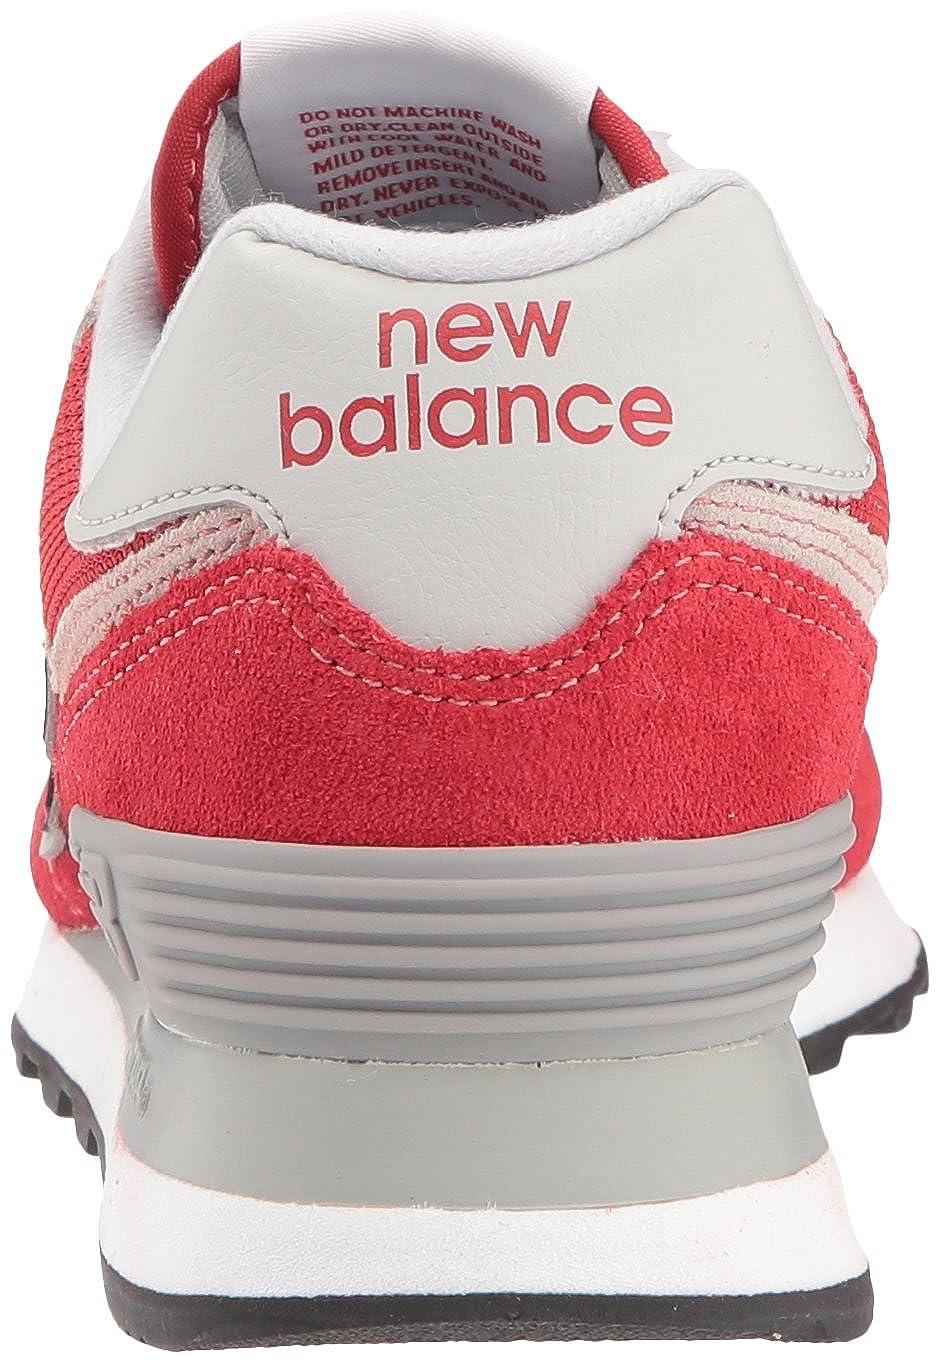 New New New Balance Herren 574v2 Turnschuhe  9bcddf